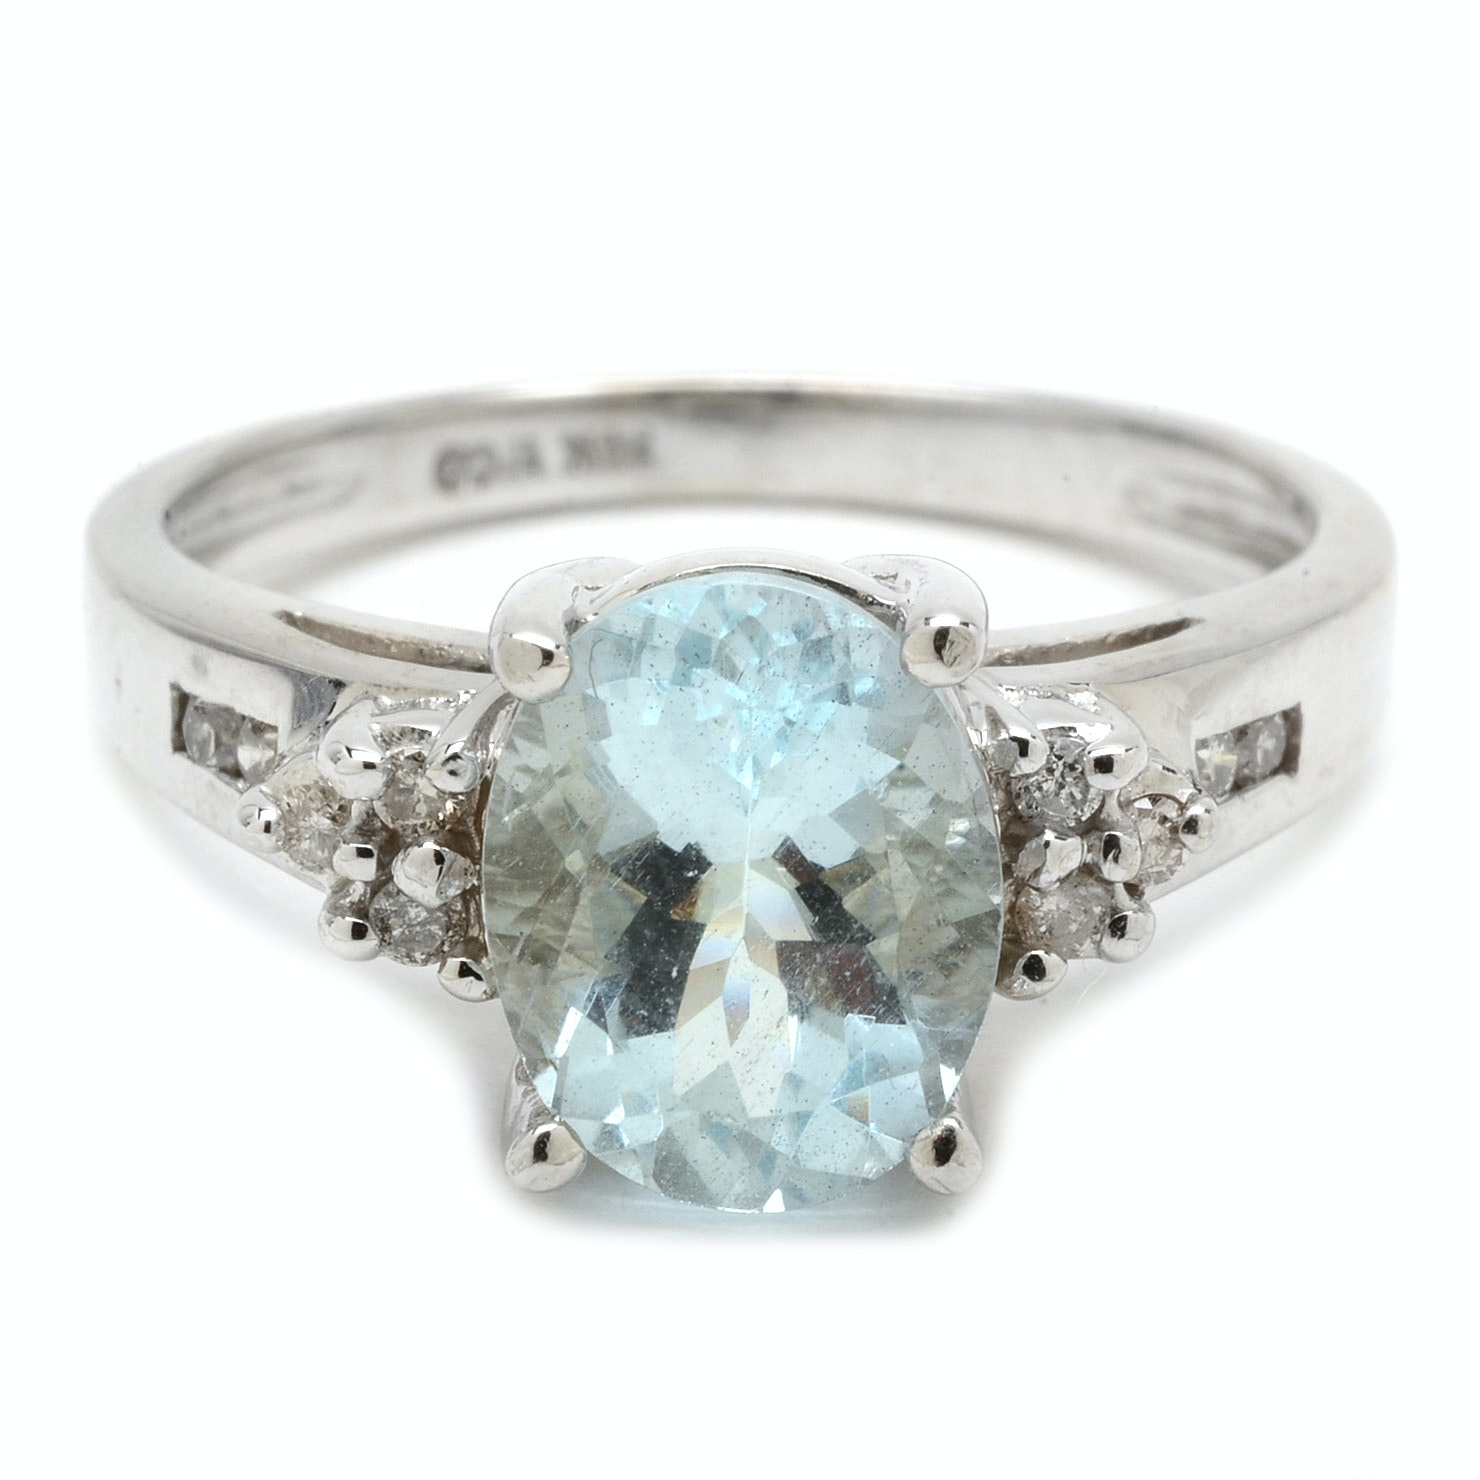 14K White Gold 2.01 Carat Aquamarine and Diamond Ring